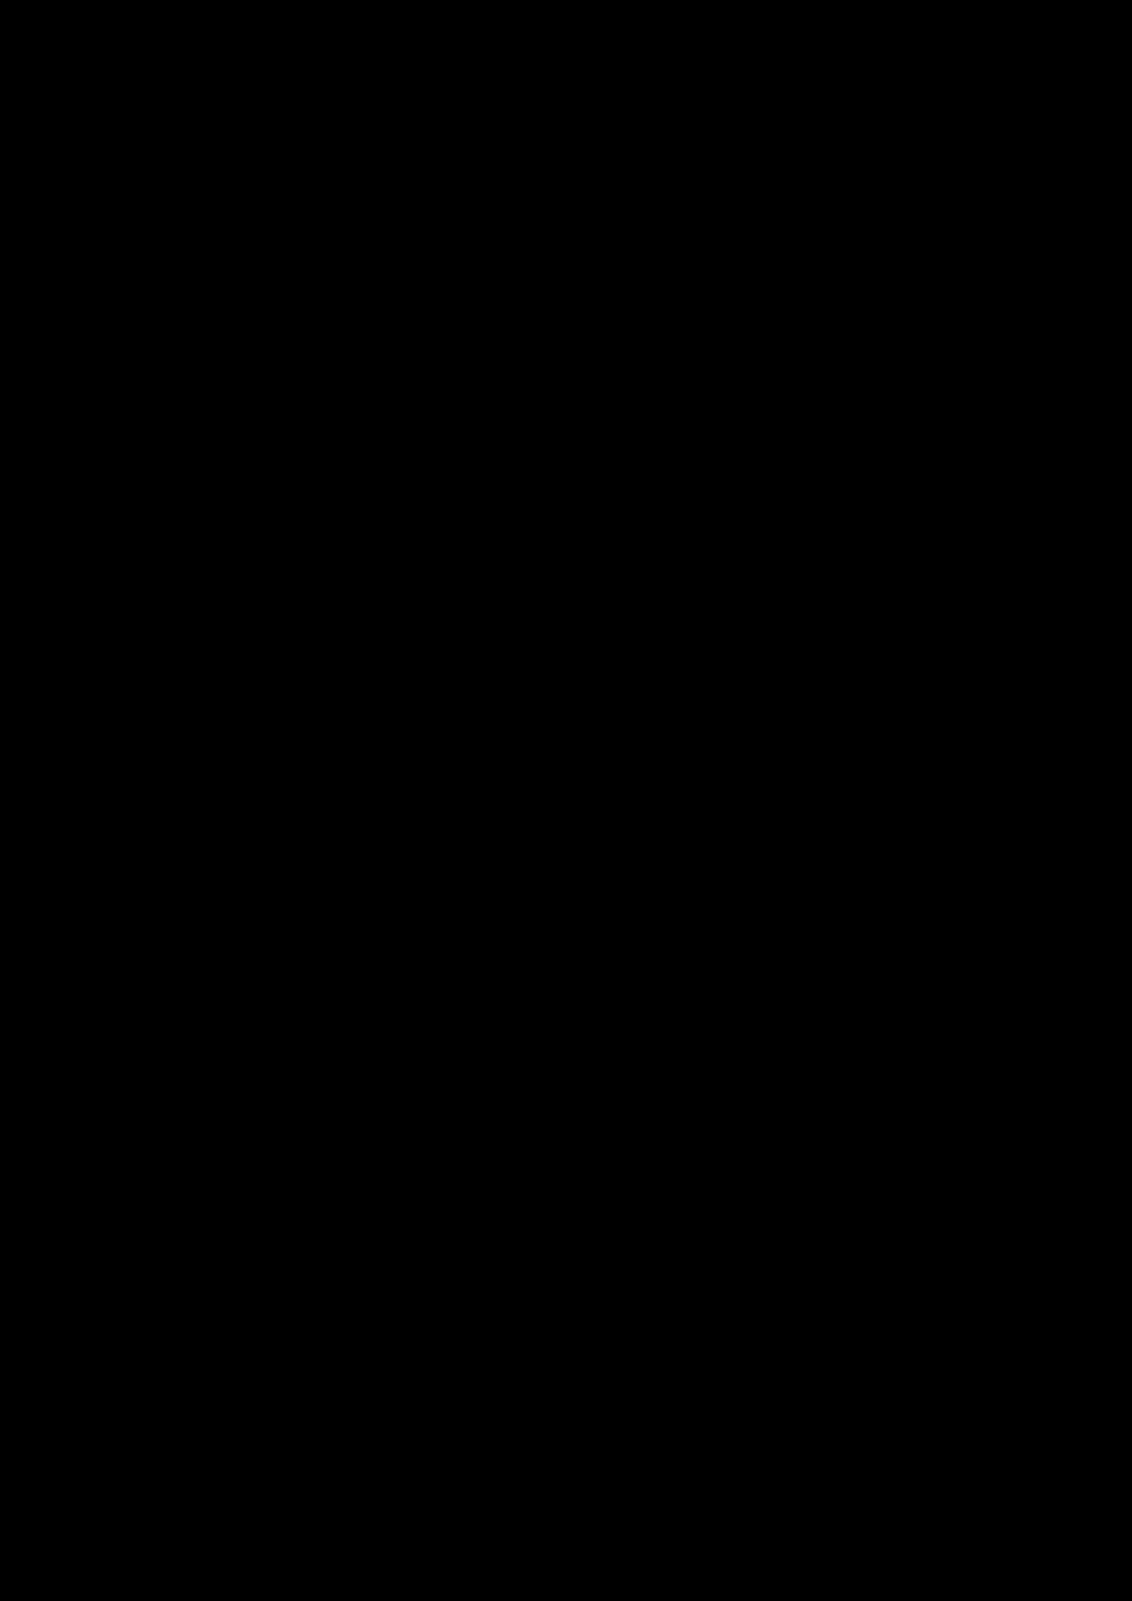 Ispoved Pervogo Boga slide, Image 26